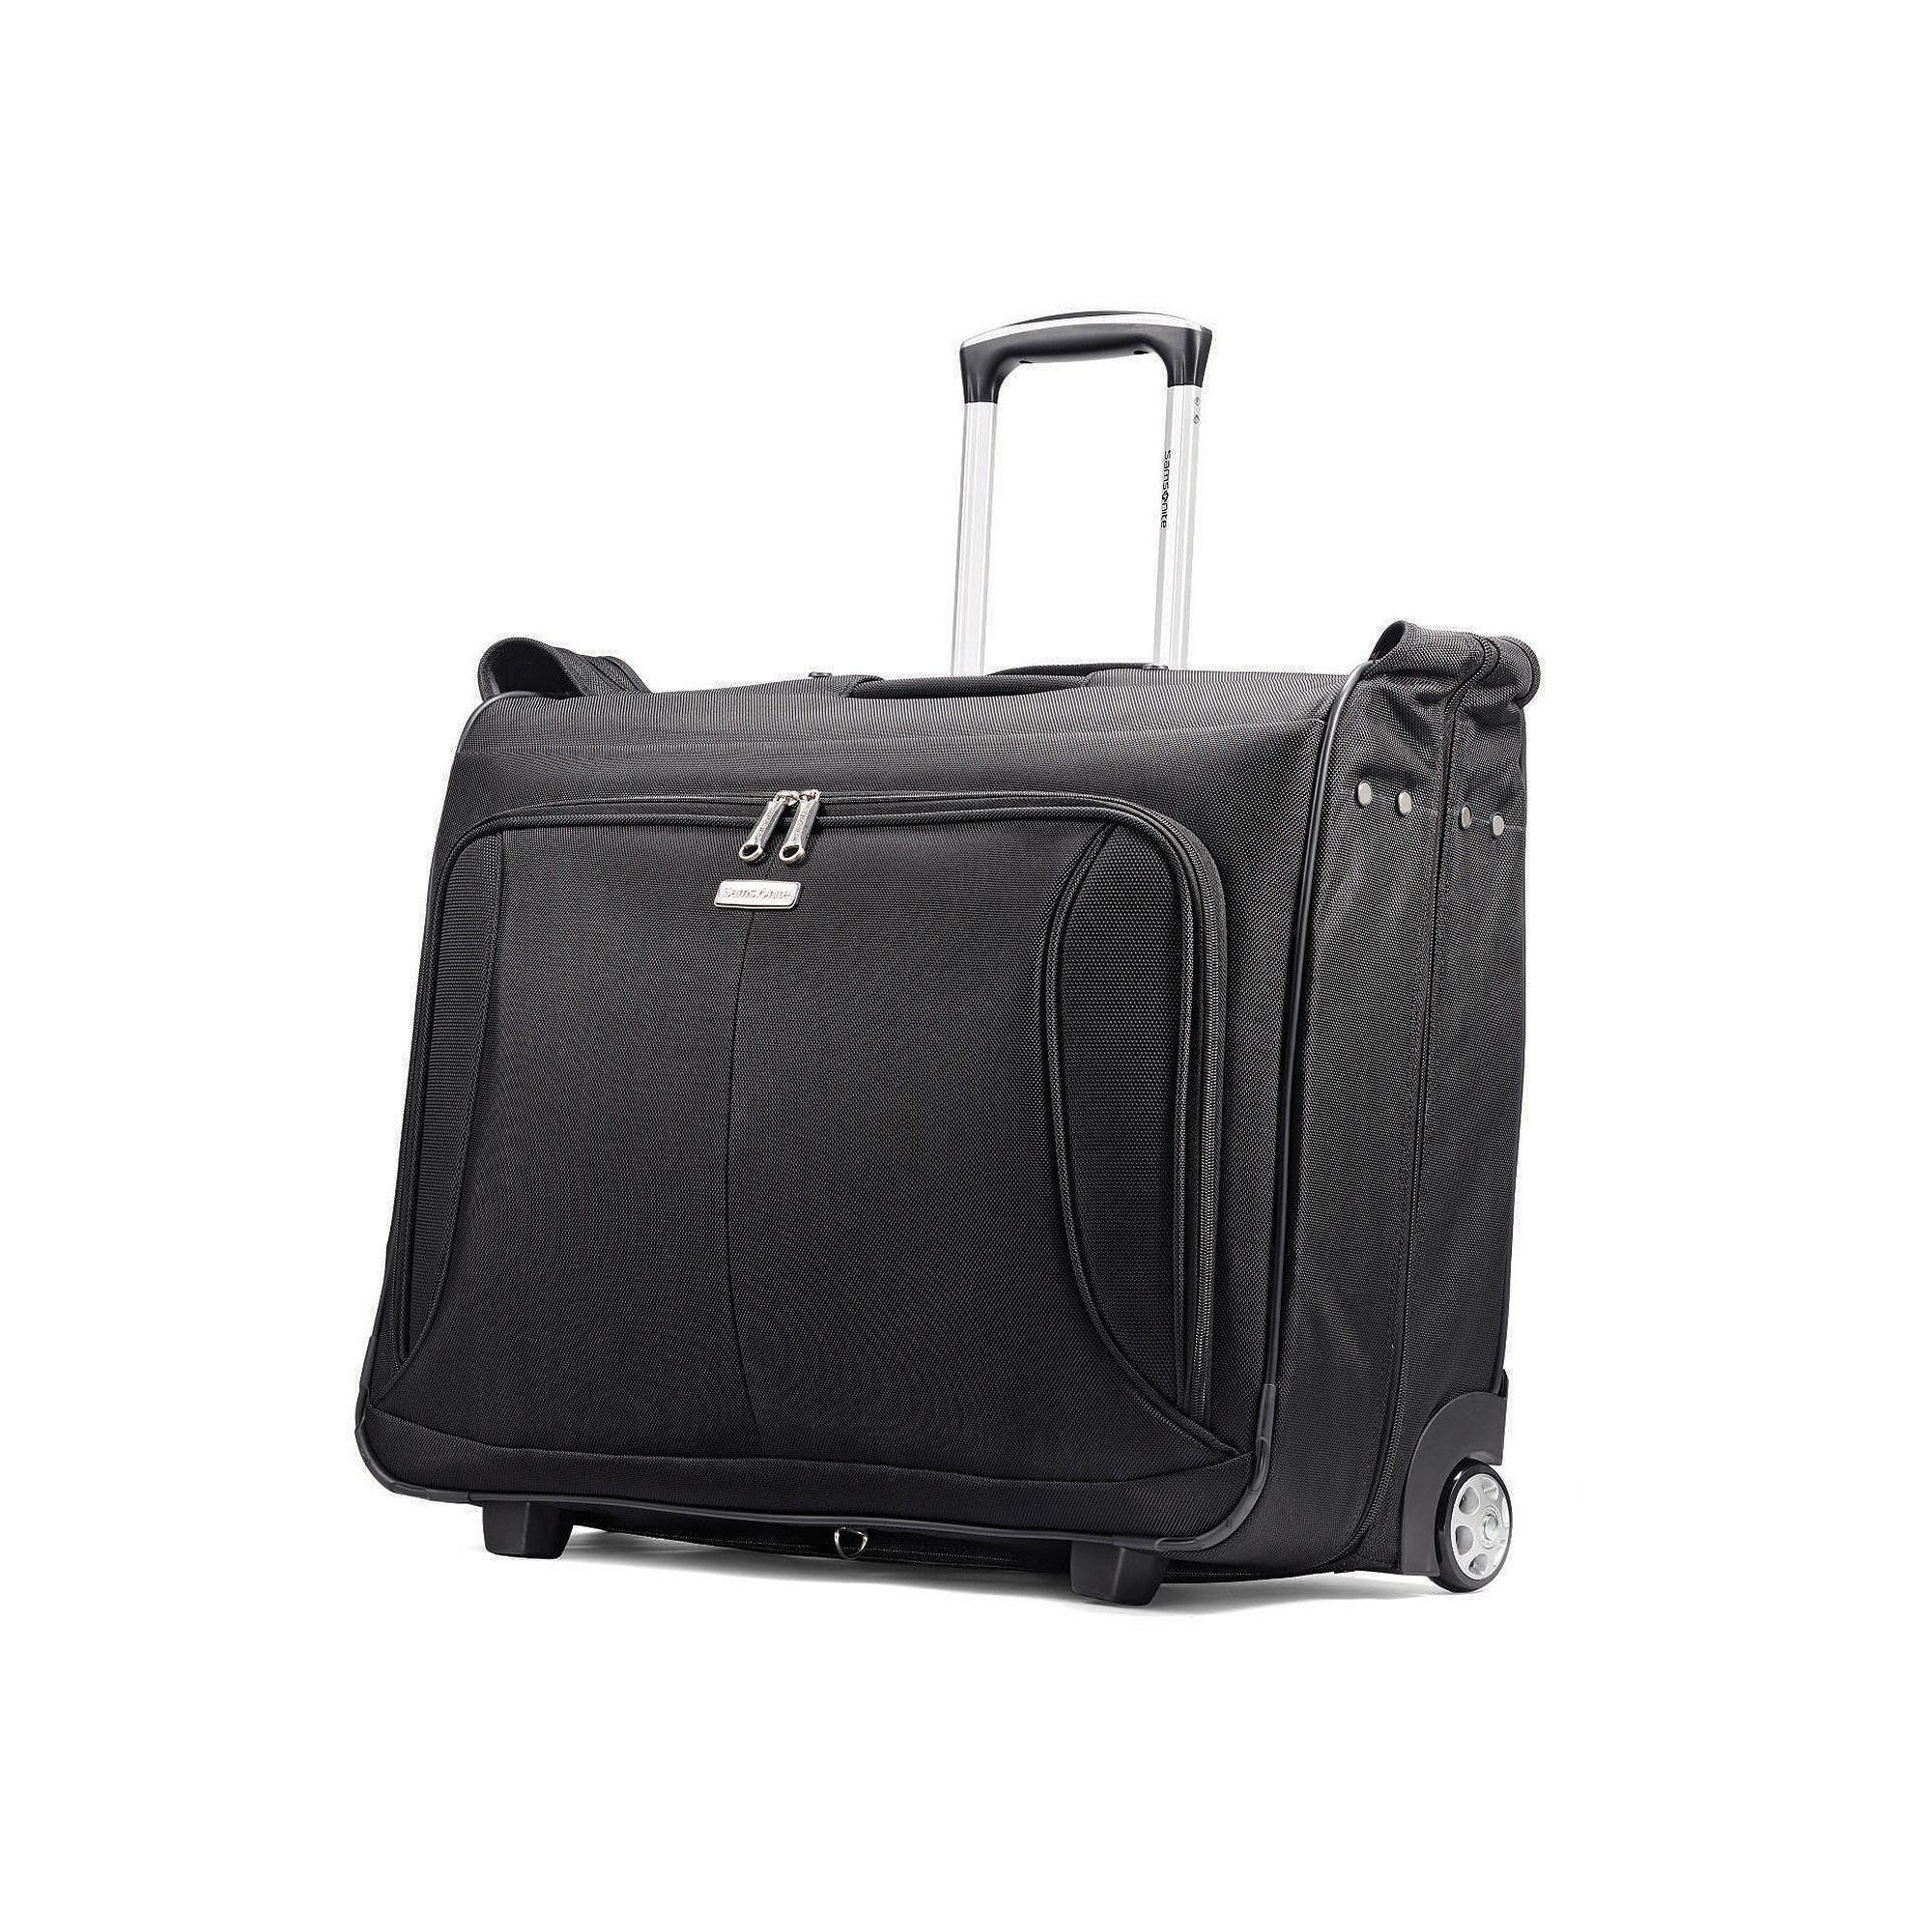 ce2ae22c072 Samsonite Aspire Xlite Rolling Garment Bag | Products